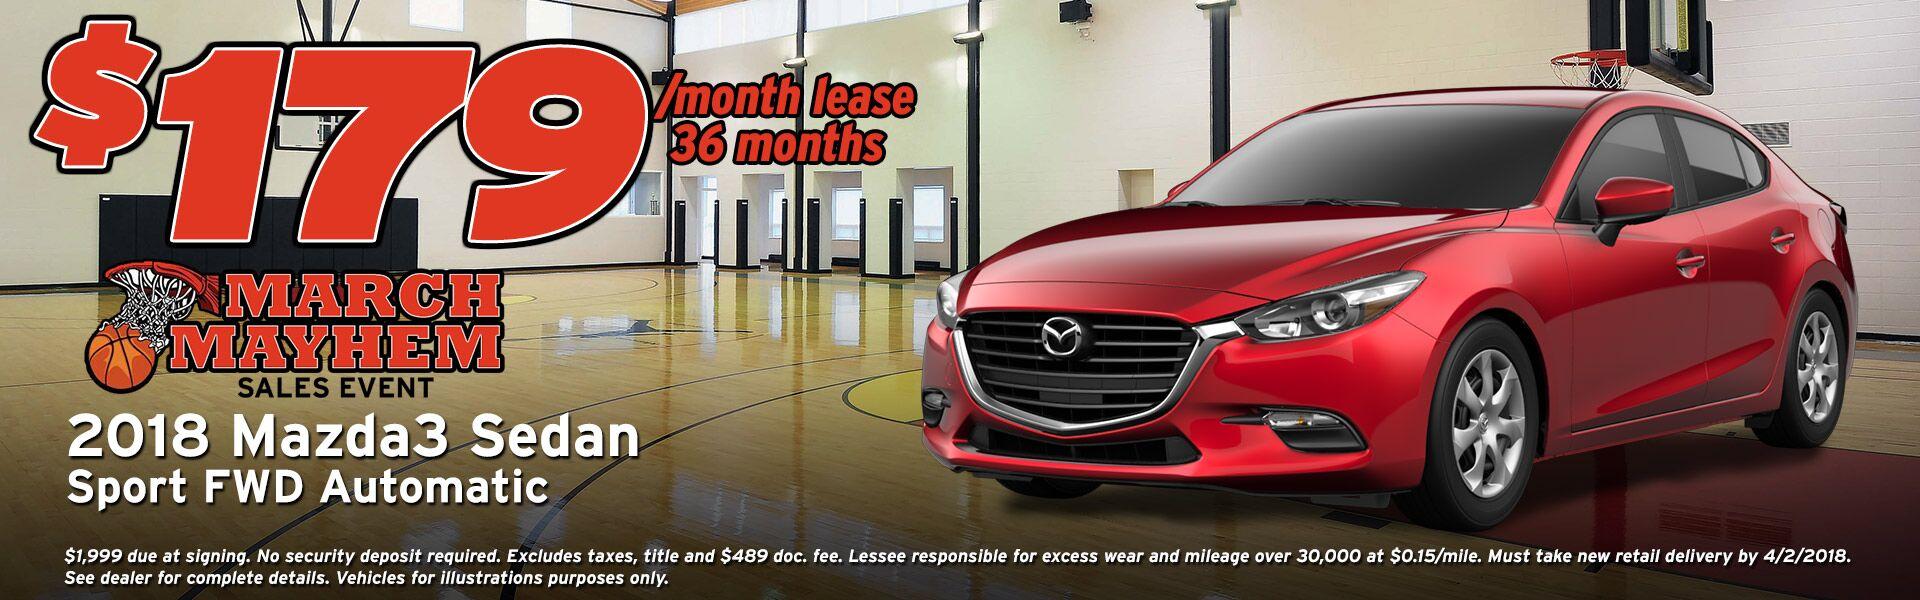 Mazda Dealership Scottsdale AZ Used Cars Earnhardt Mazda - Ford mazda dealership